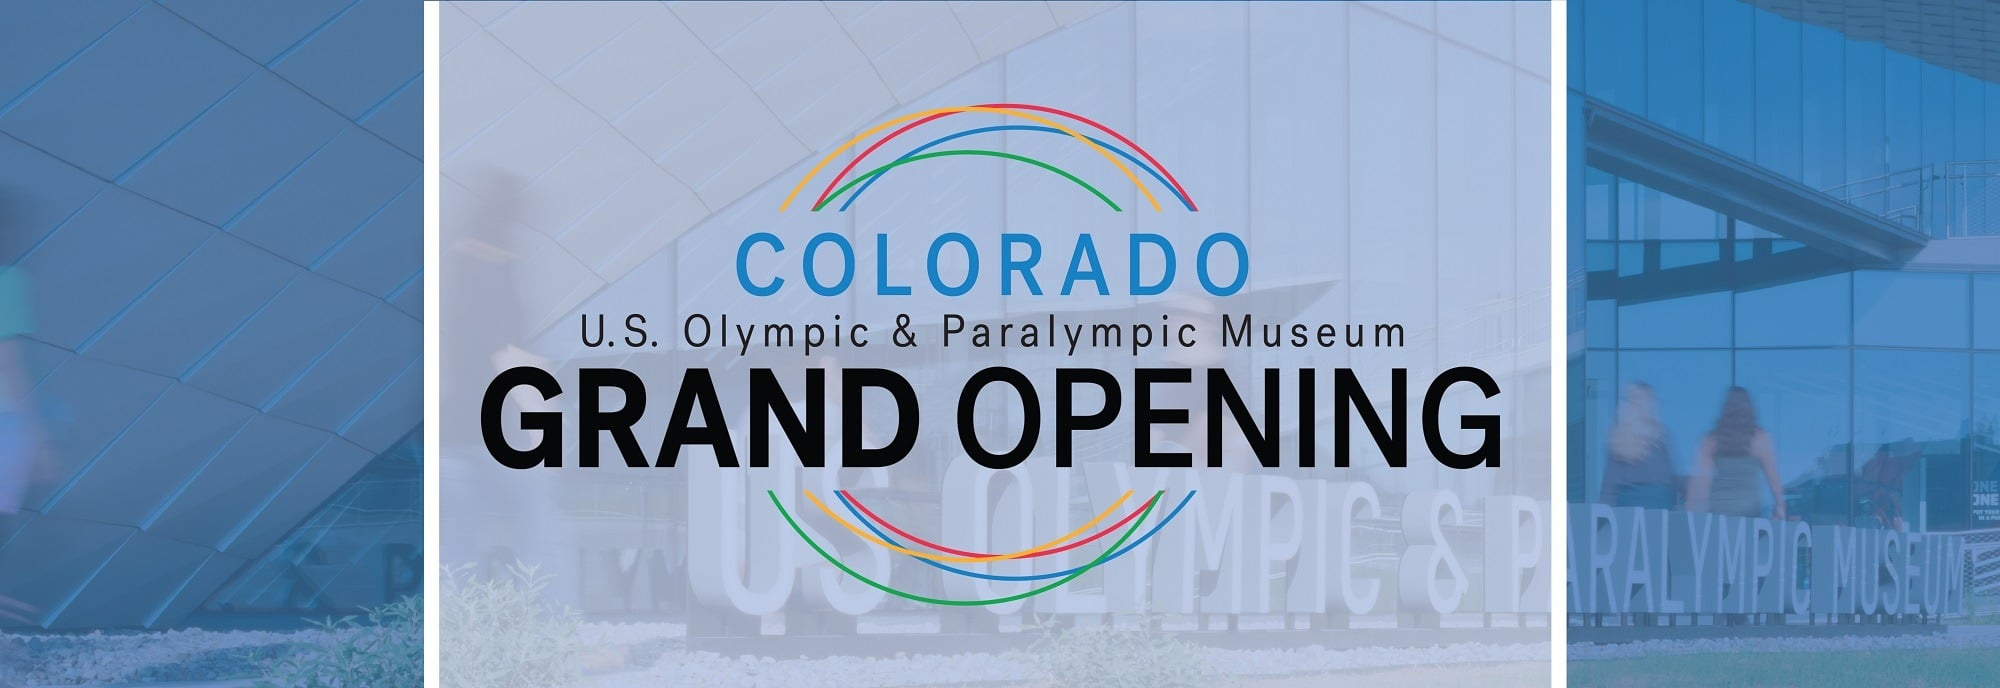 Colorado Grand Opening at USOPMuseum